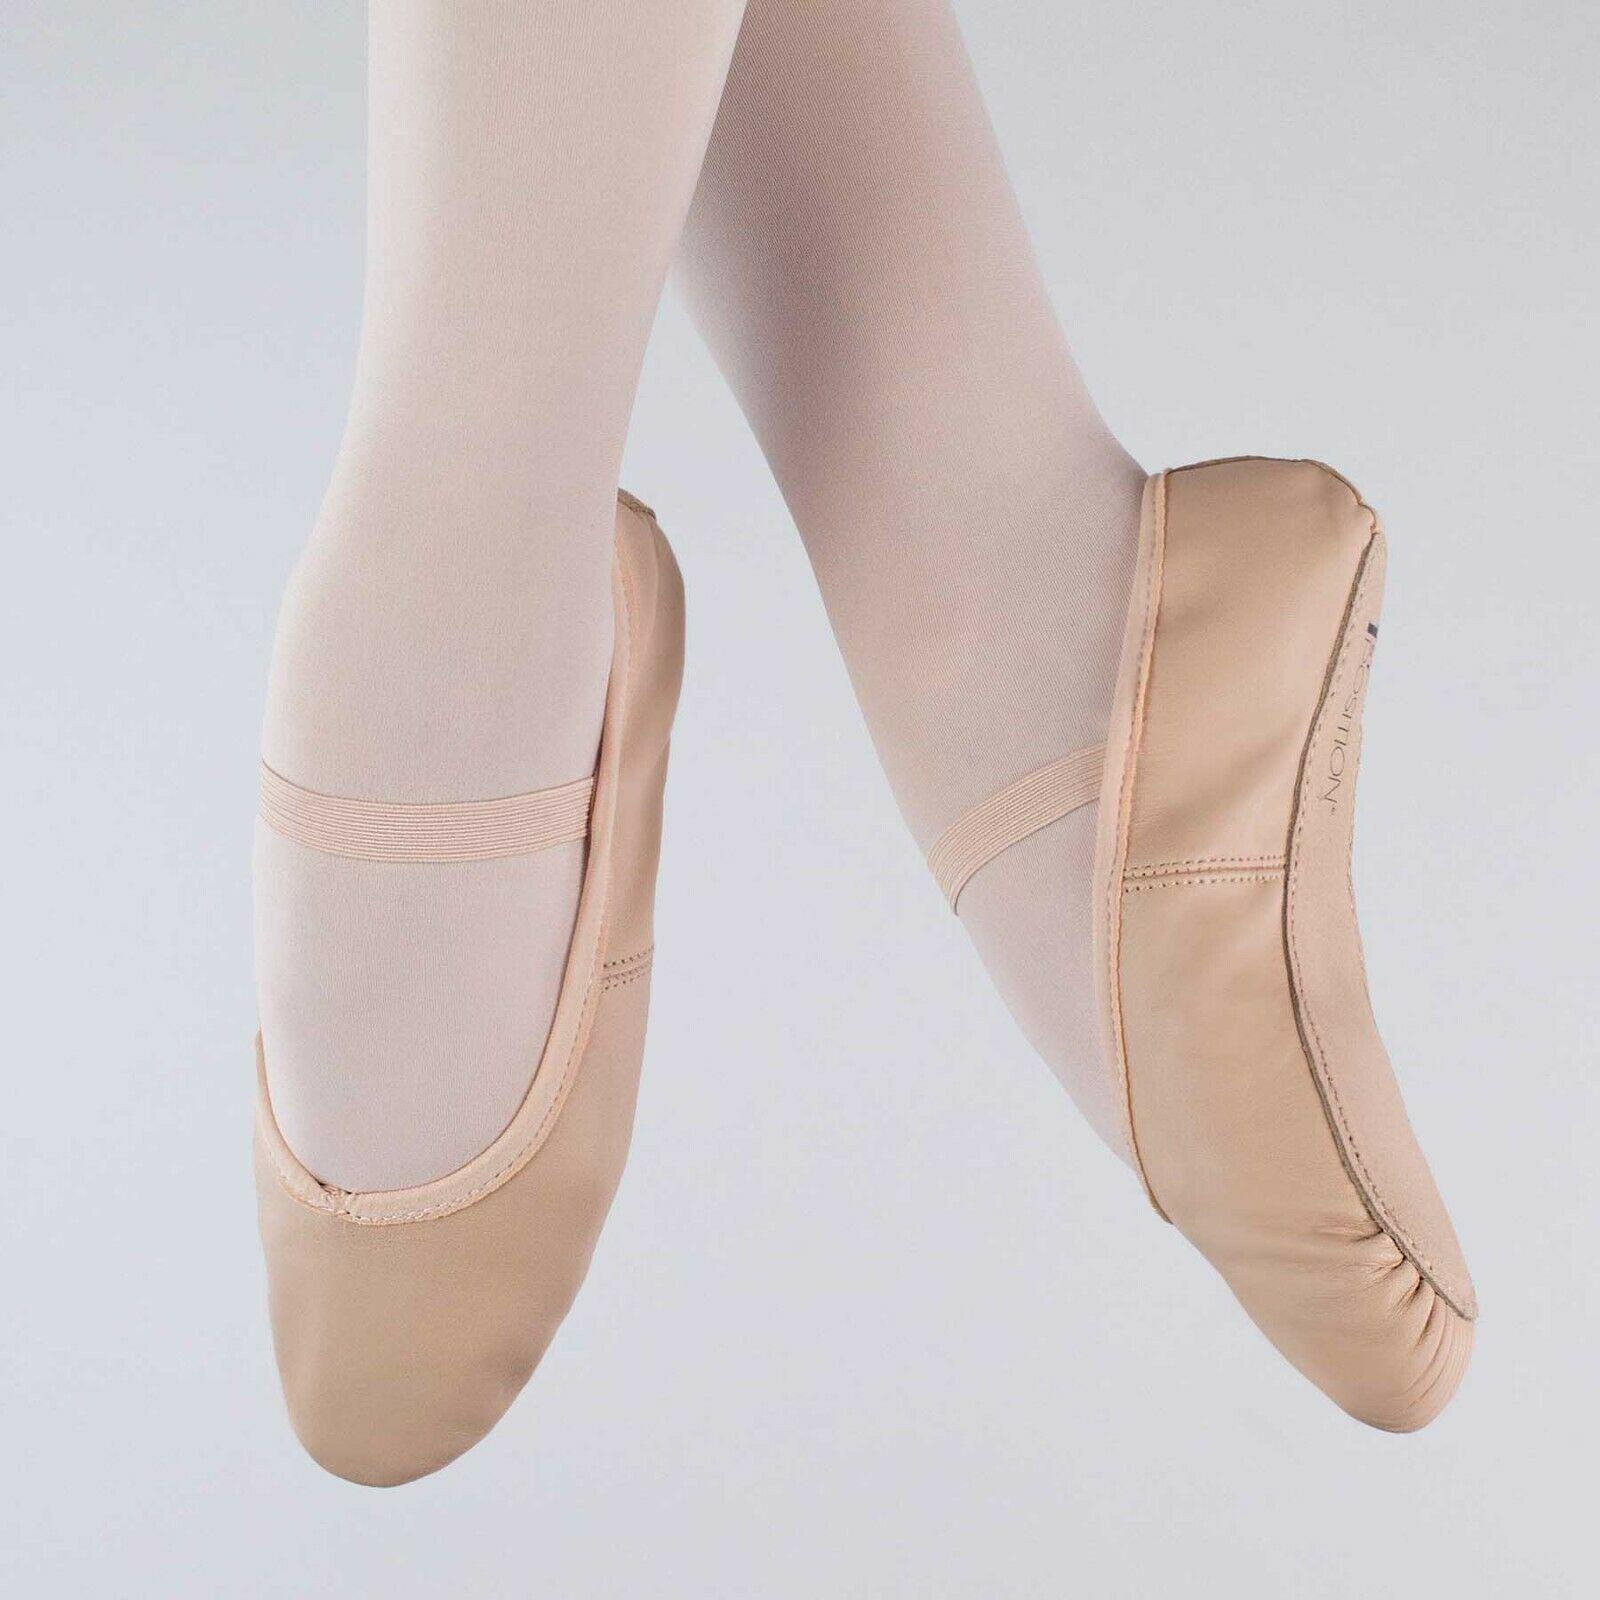 girls ballet shoes